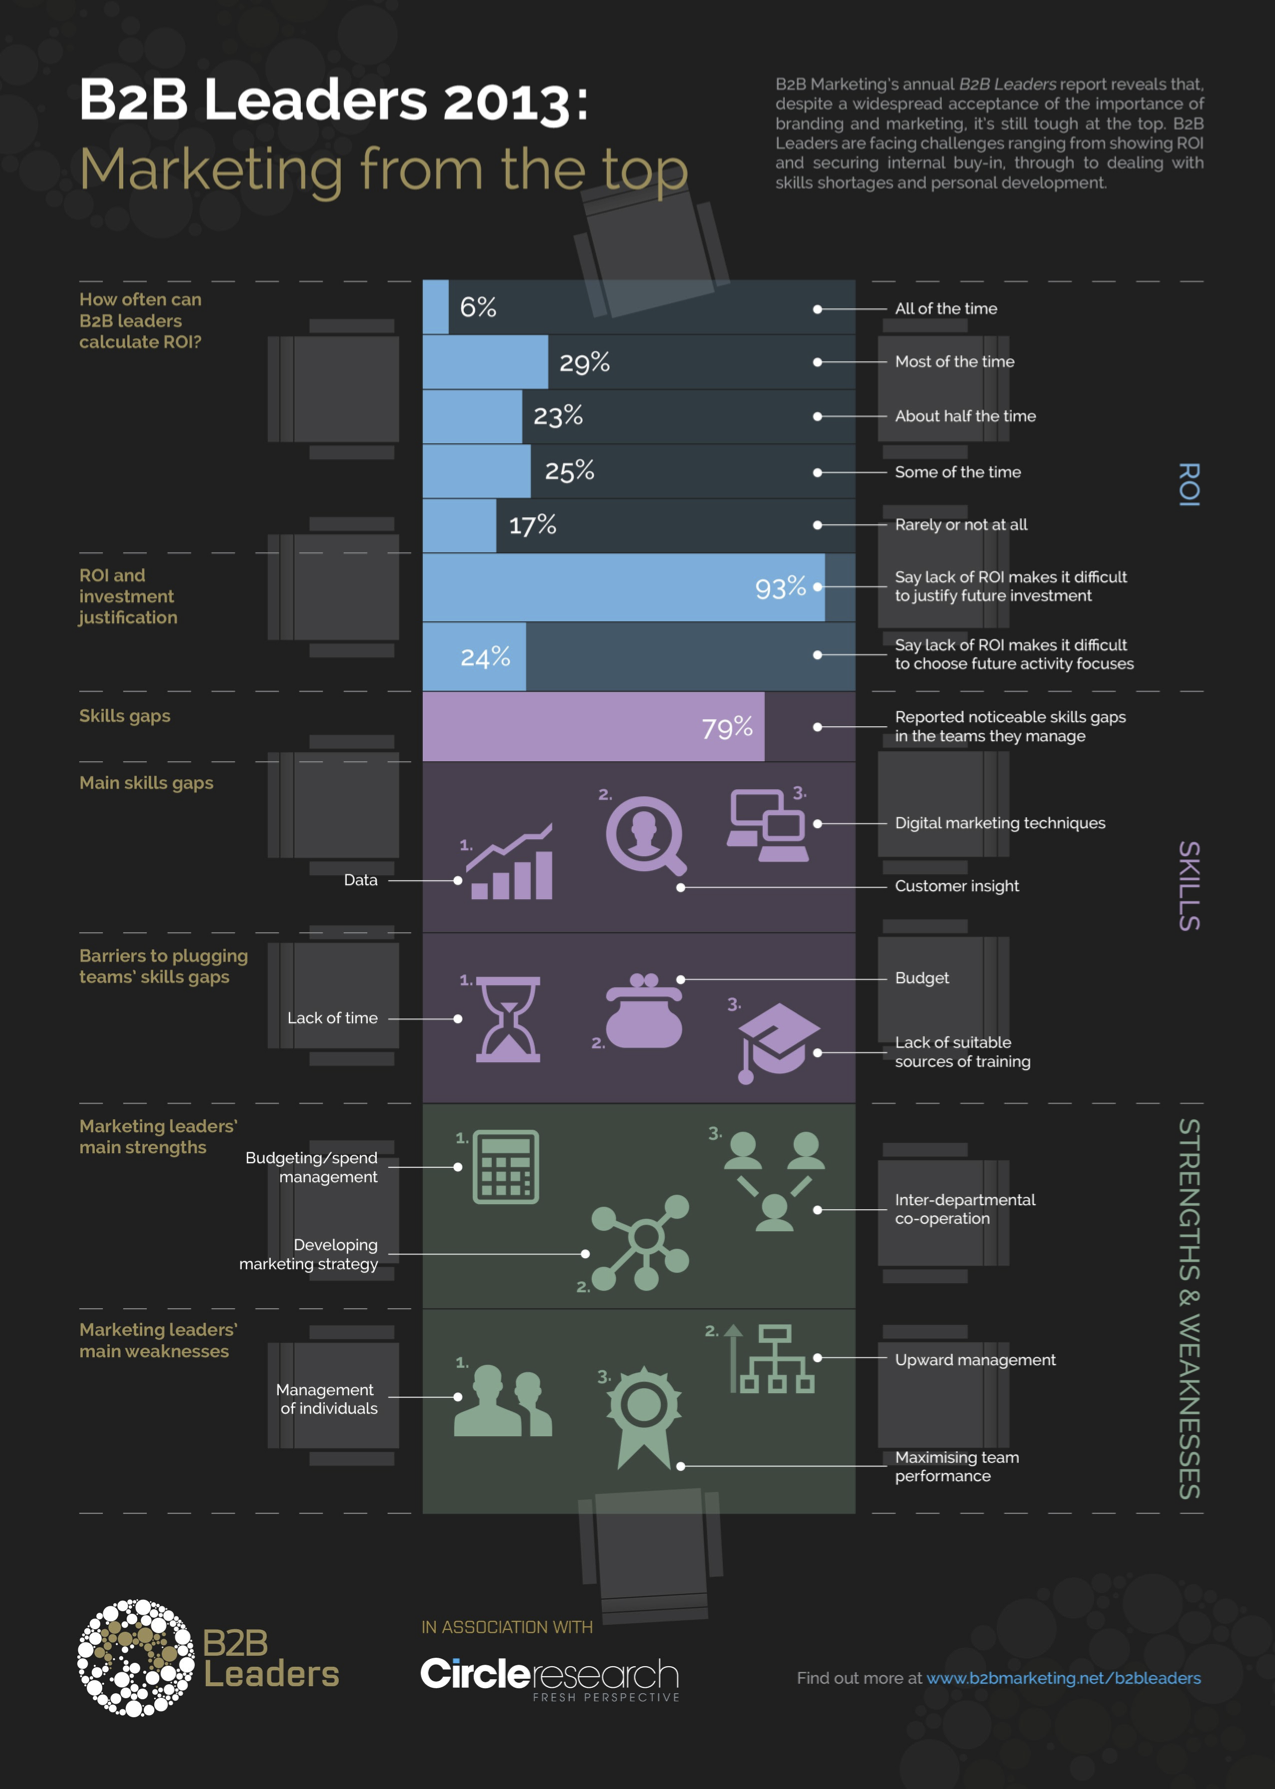 B2B Marketing in 2013